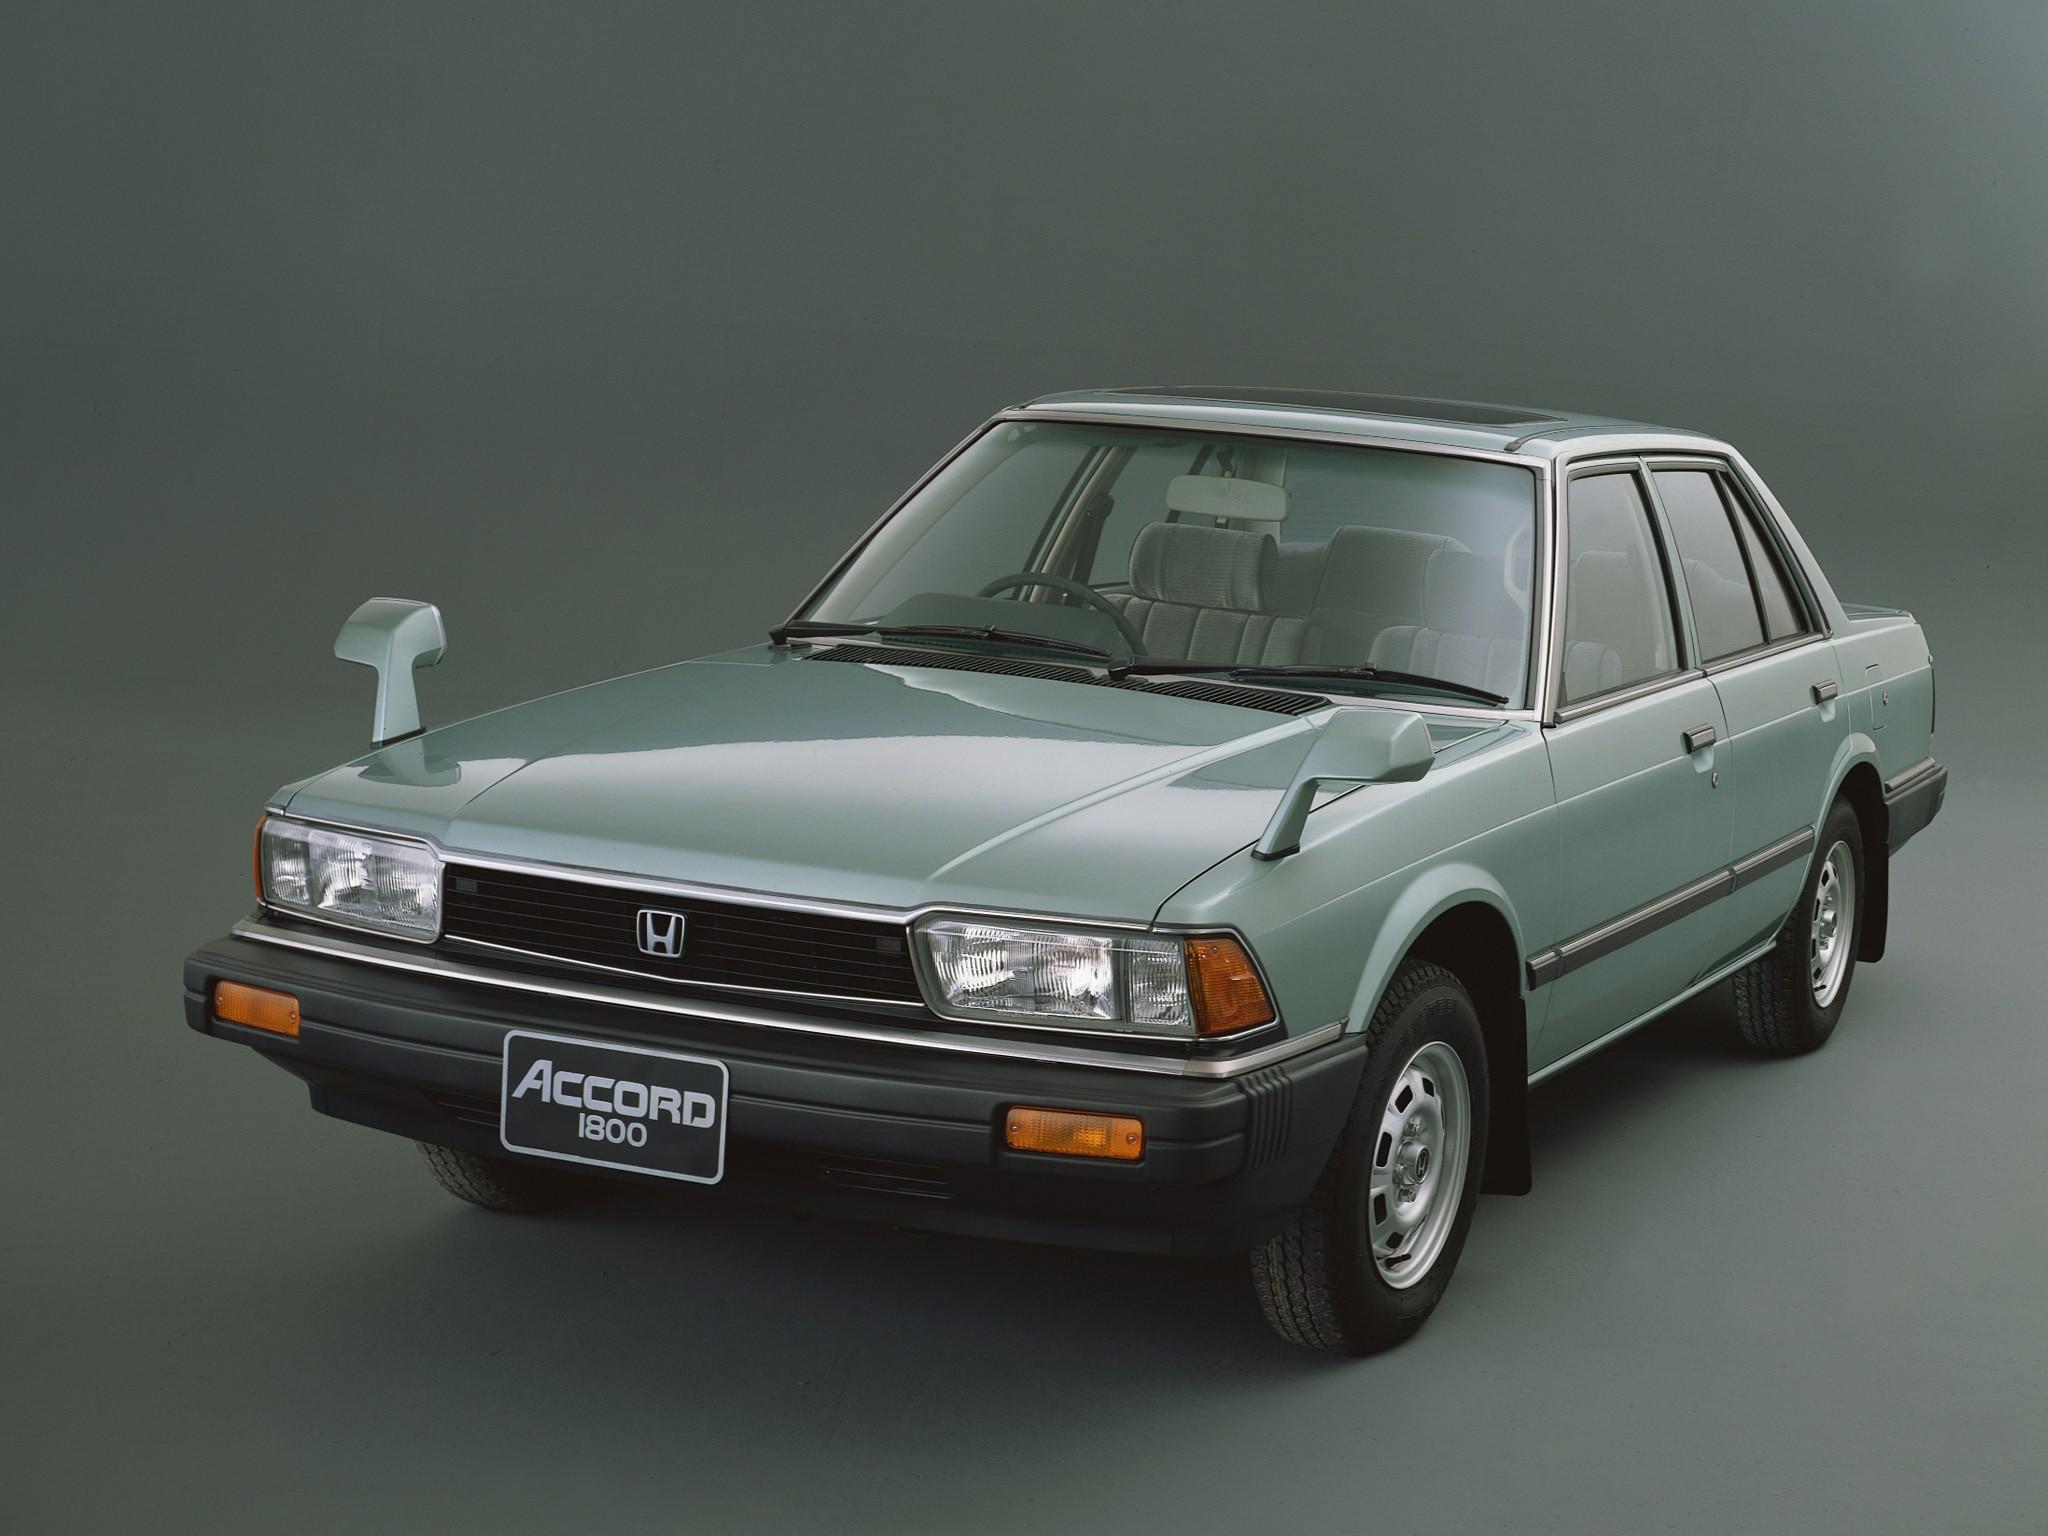 2019 Honda Accord Sport >> HONDA Accord 4 Doors specs & photos - 1981, 1982, 1983, 1984, 1985 - autoevolution